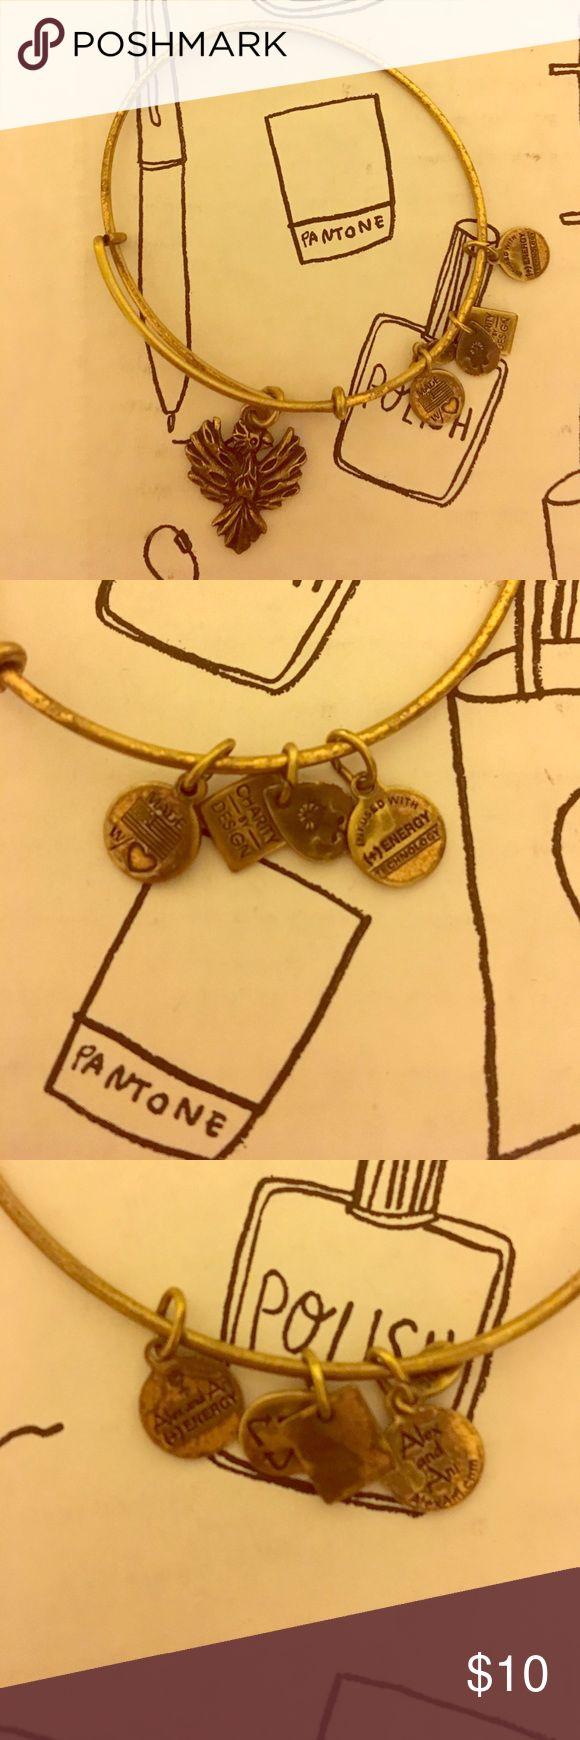 Alex & Ani Phoenix Bangle Phoenix bangle from Alex & Ani in gold. Alex & Ani Jewelry Bracelets